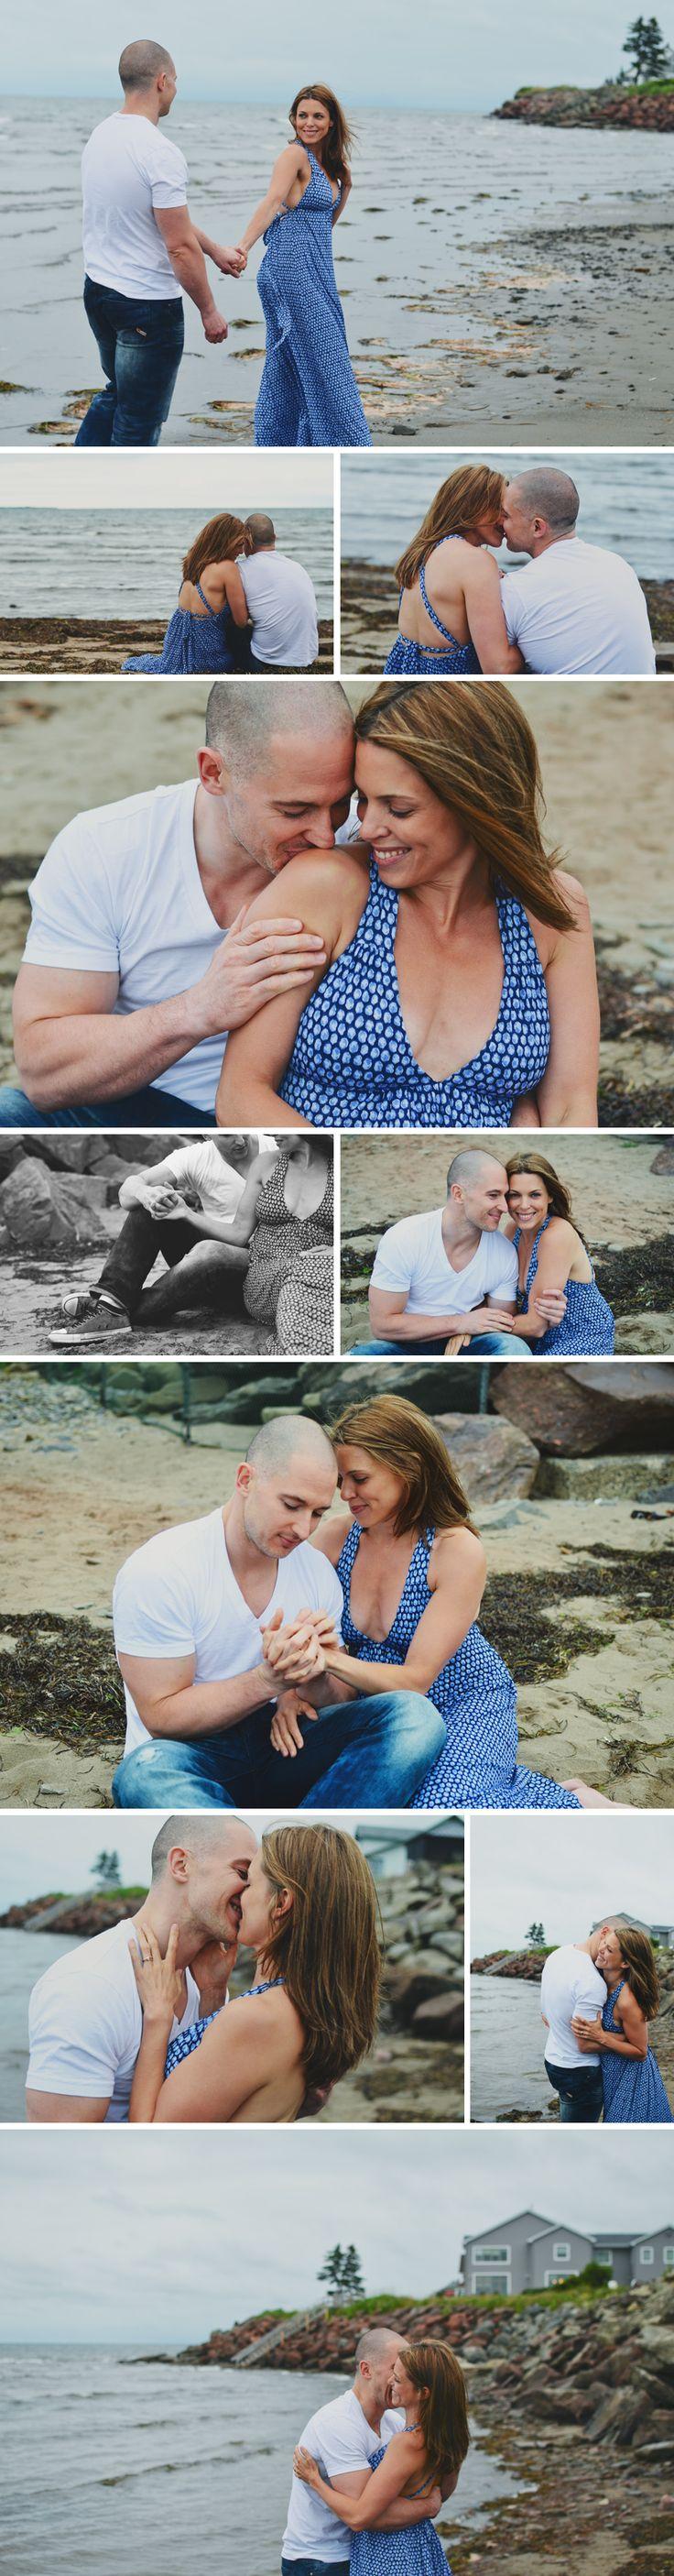 Romantic beach lifestyle engagement shoot